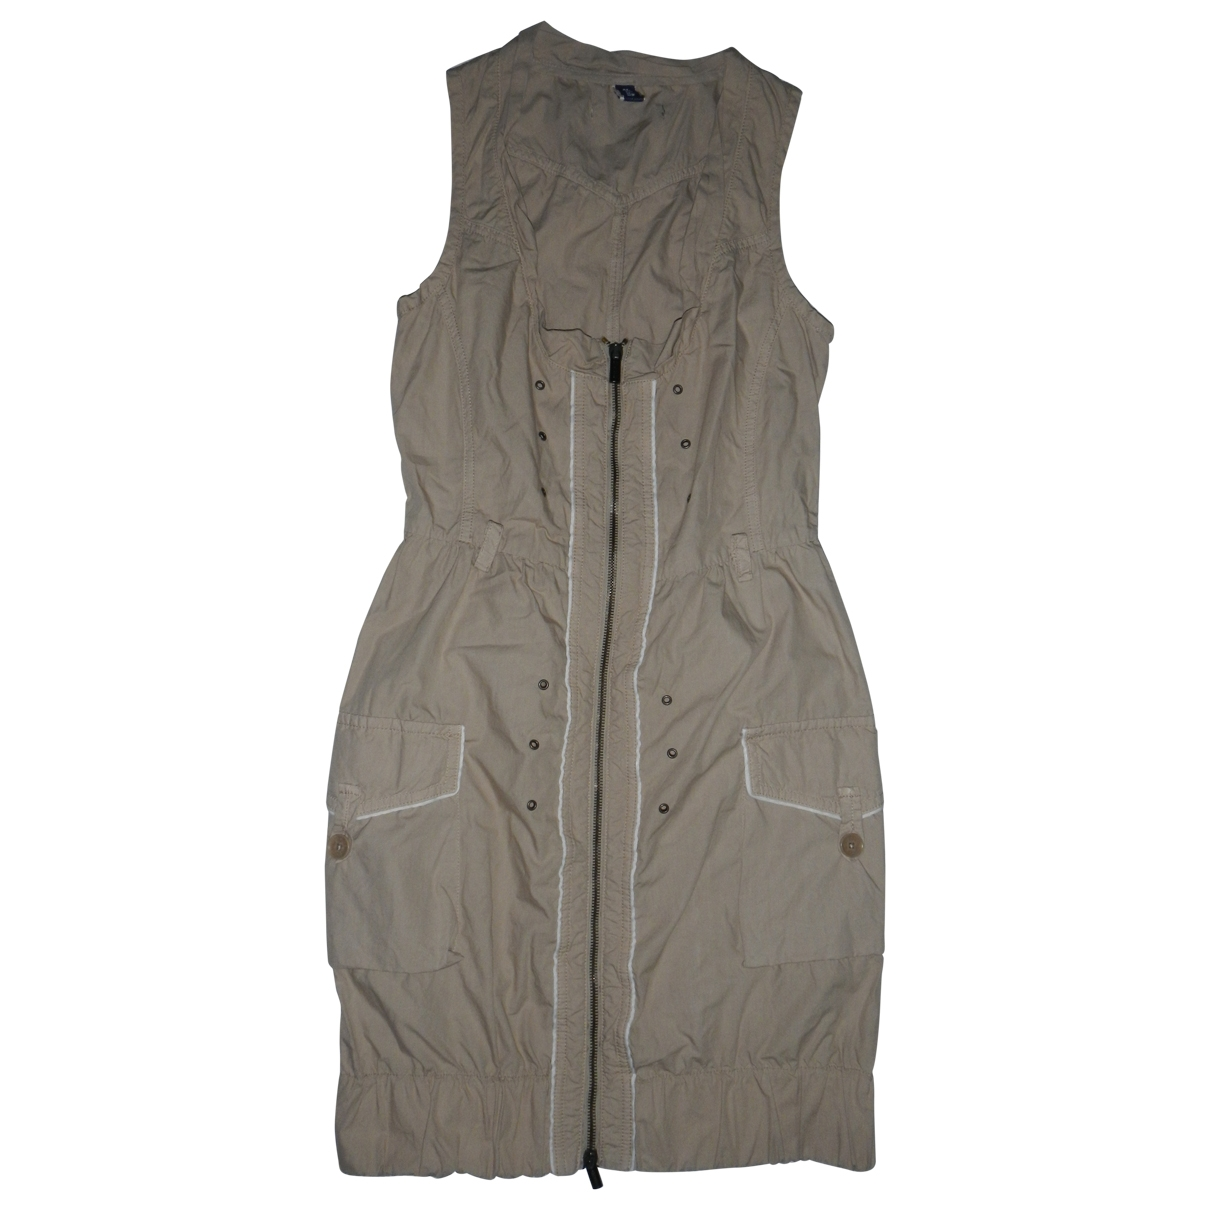 Jean Paul Gaultier \N Kleid in  Beige Baumwolle